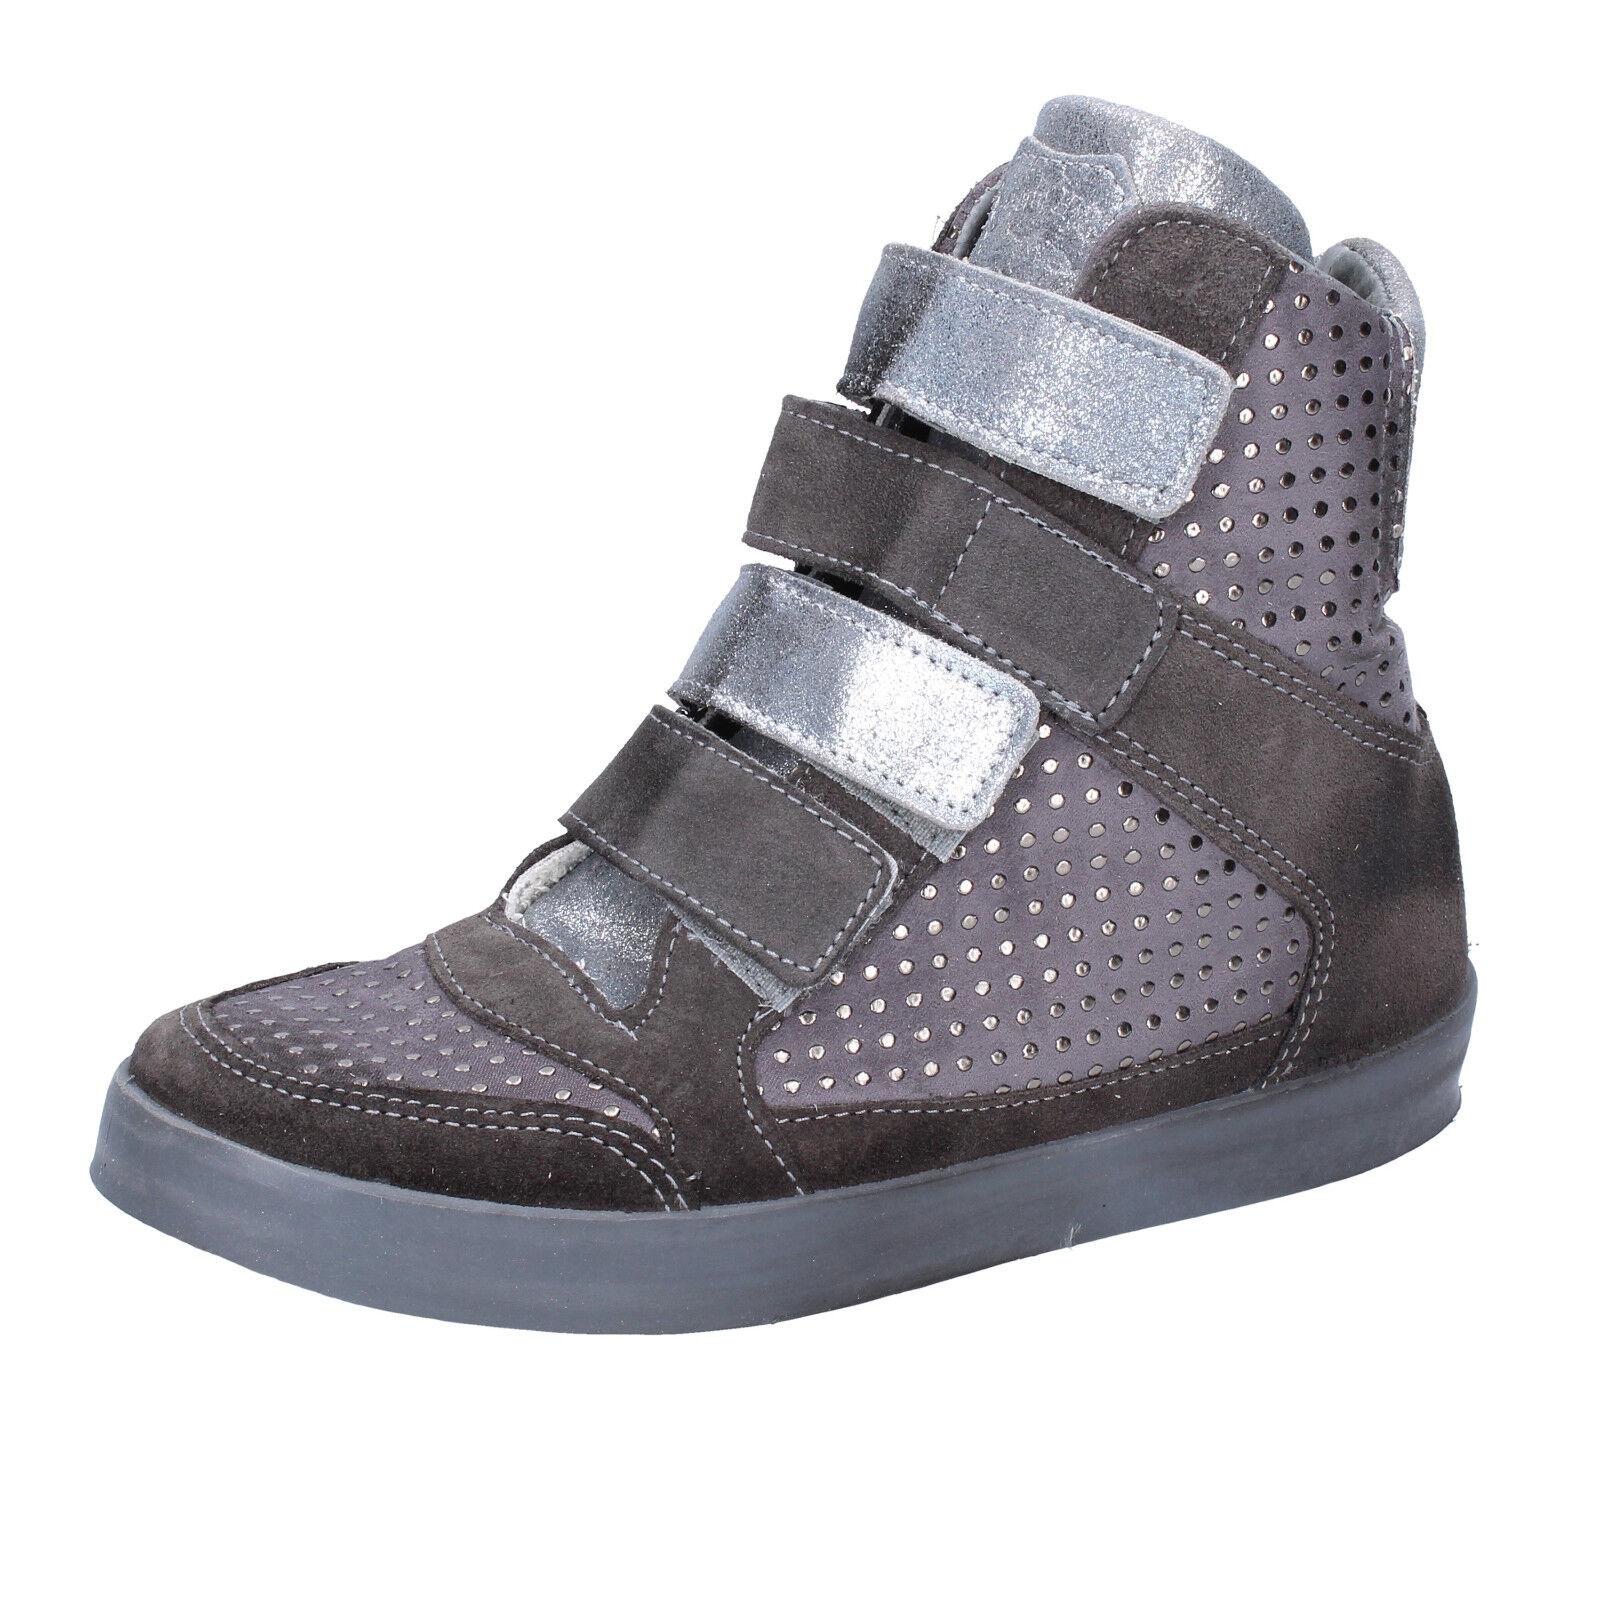 Damen schuhe BEVERLY HILLS POLO CLUB 37 EU sneakers grau wildleder AJ15-37